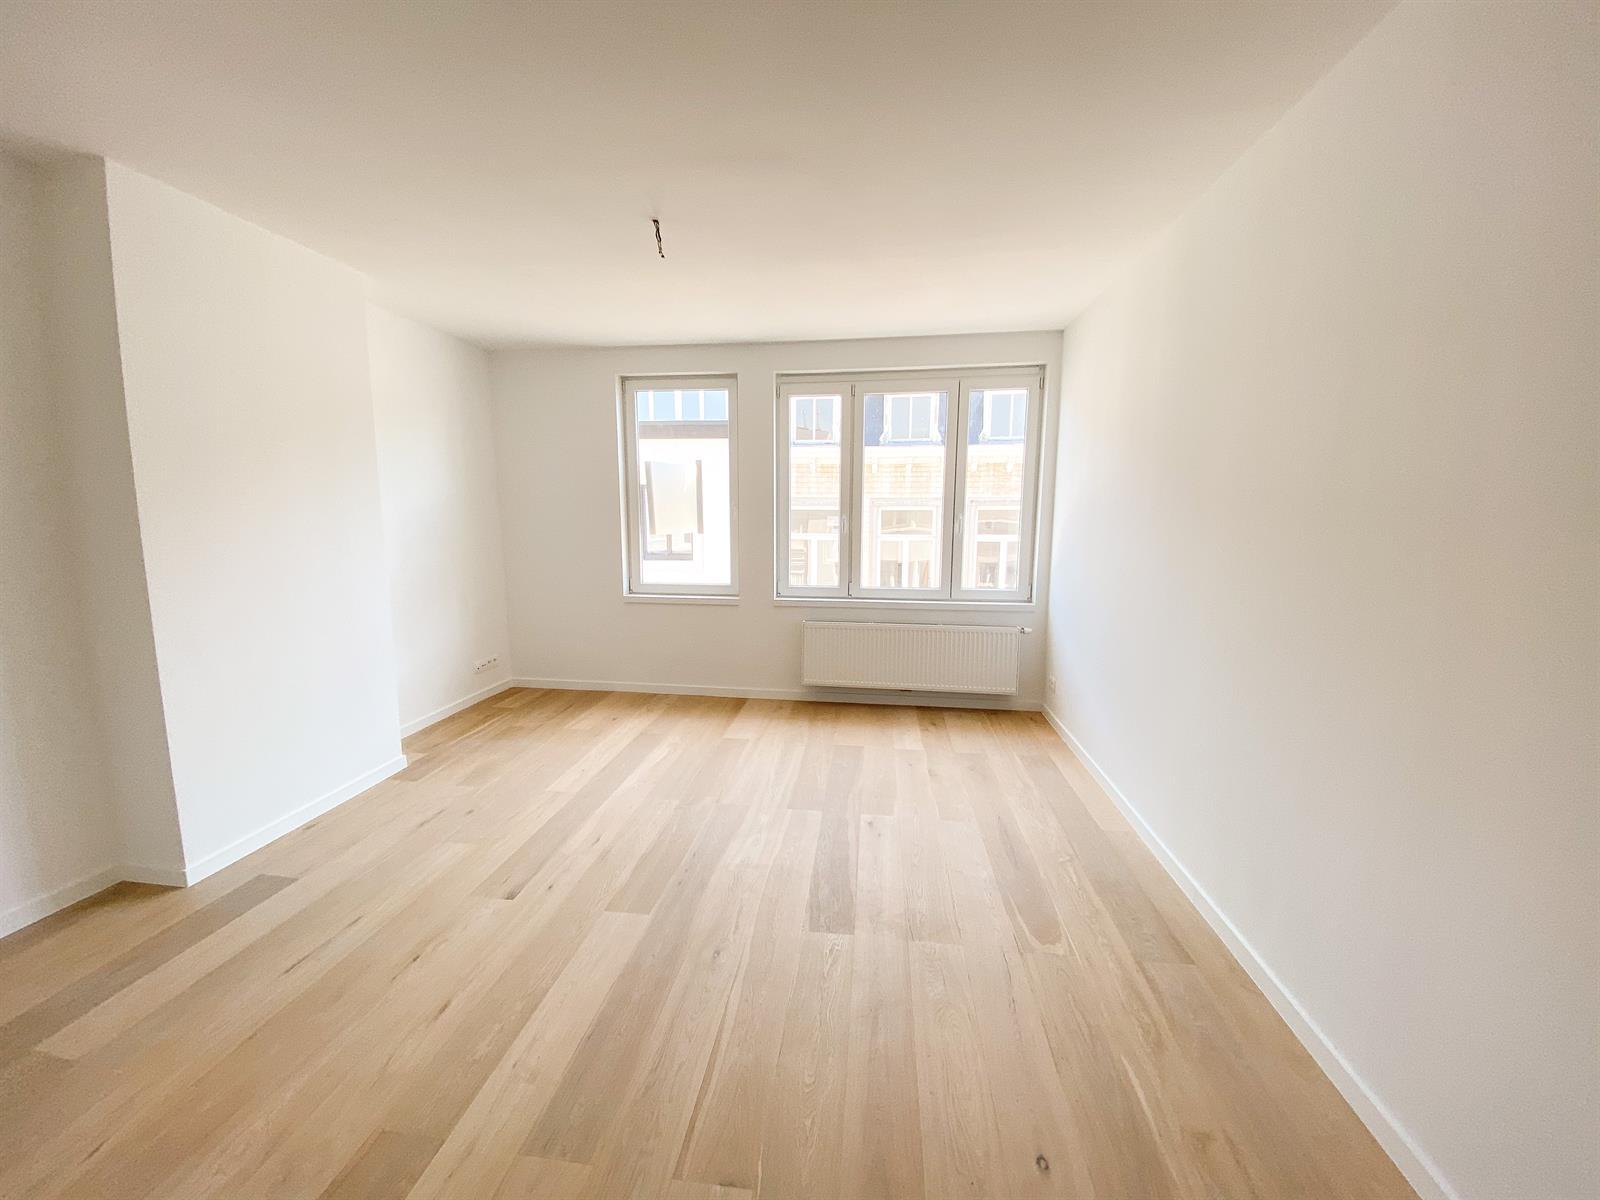 Appartement - Liège - #4045817-4